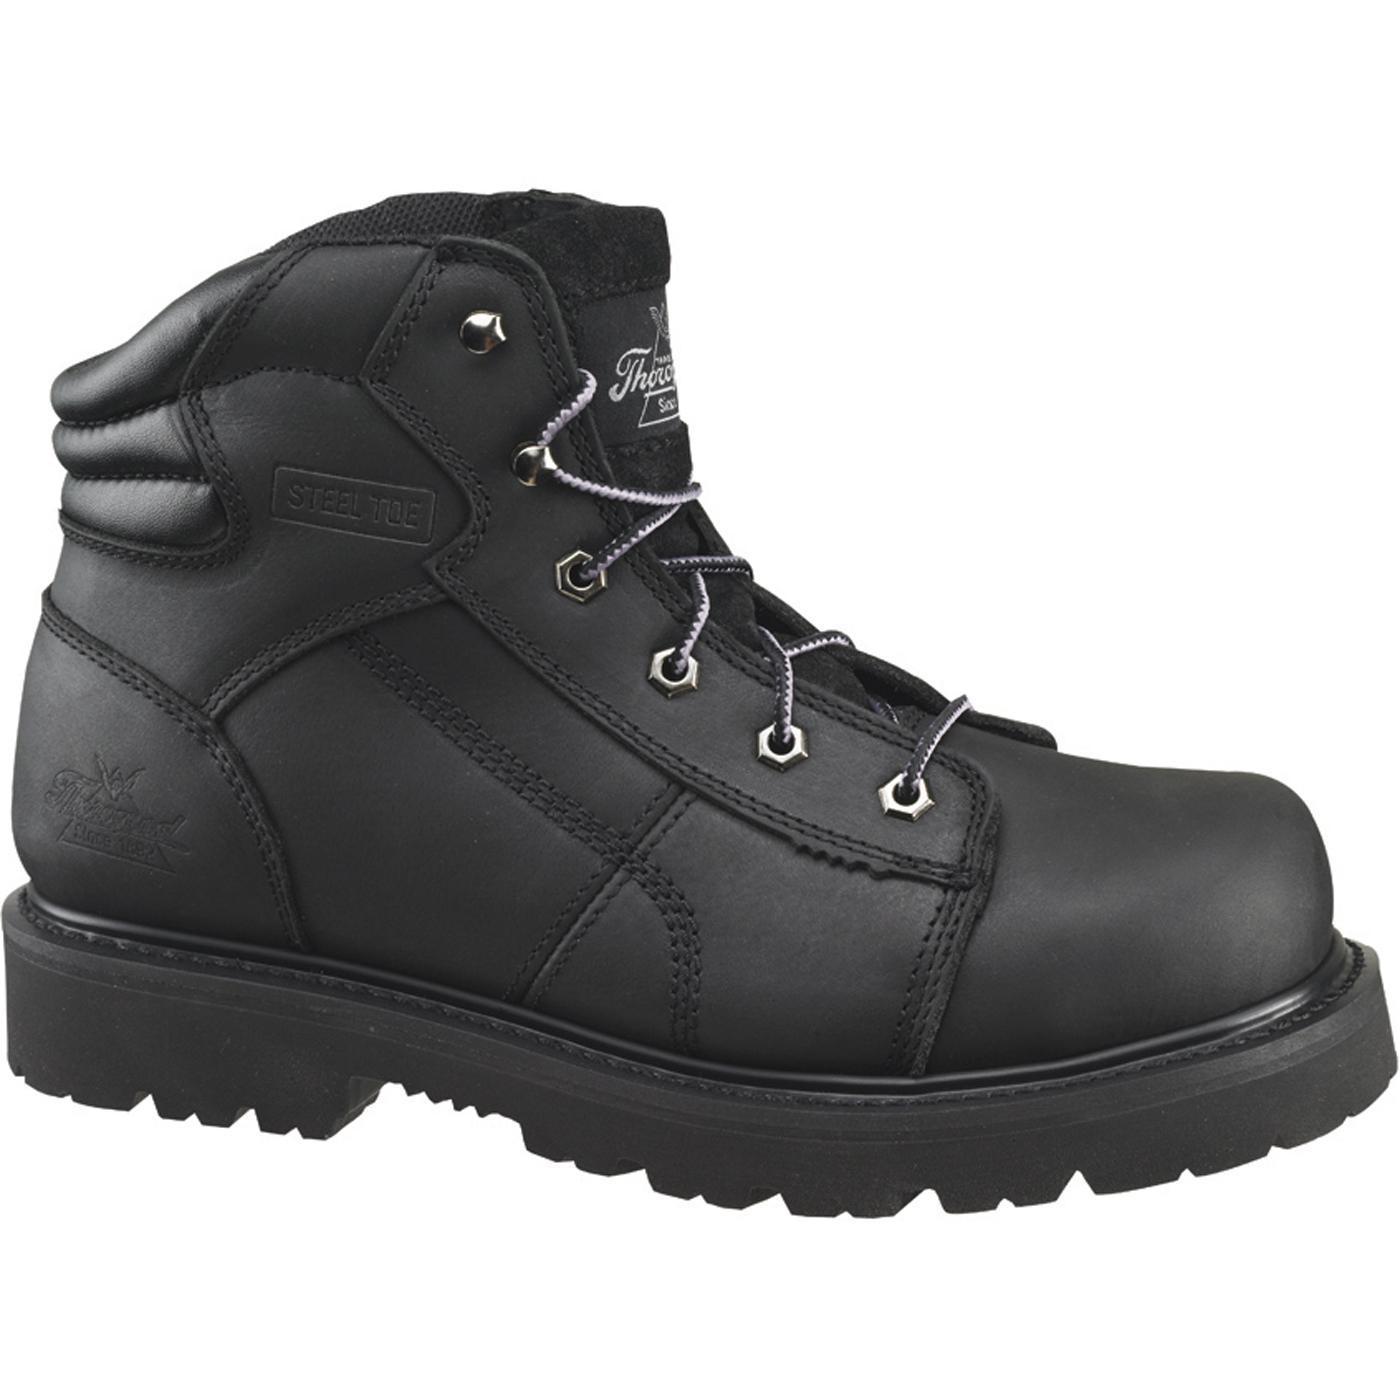 Thorogood Steel Toe American Made Work Boots 804 6450